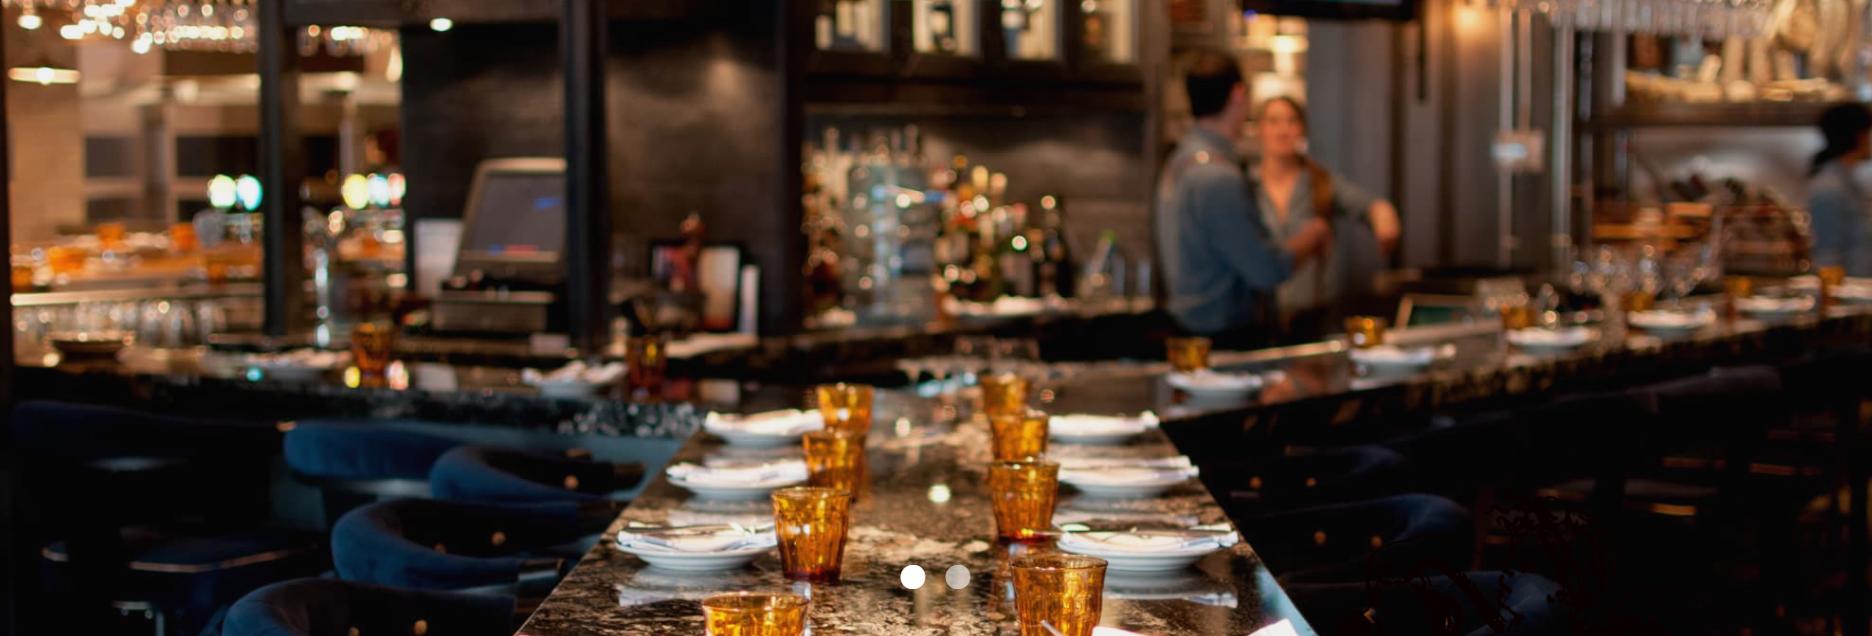 Taverna Mercatto is a Tribute to the Classic Italian Tavern